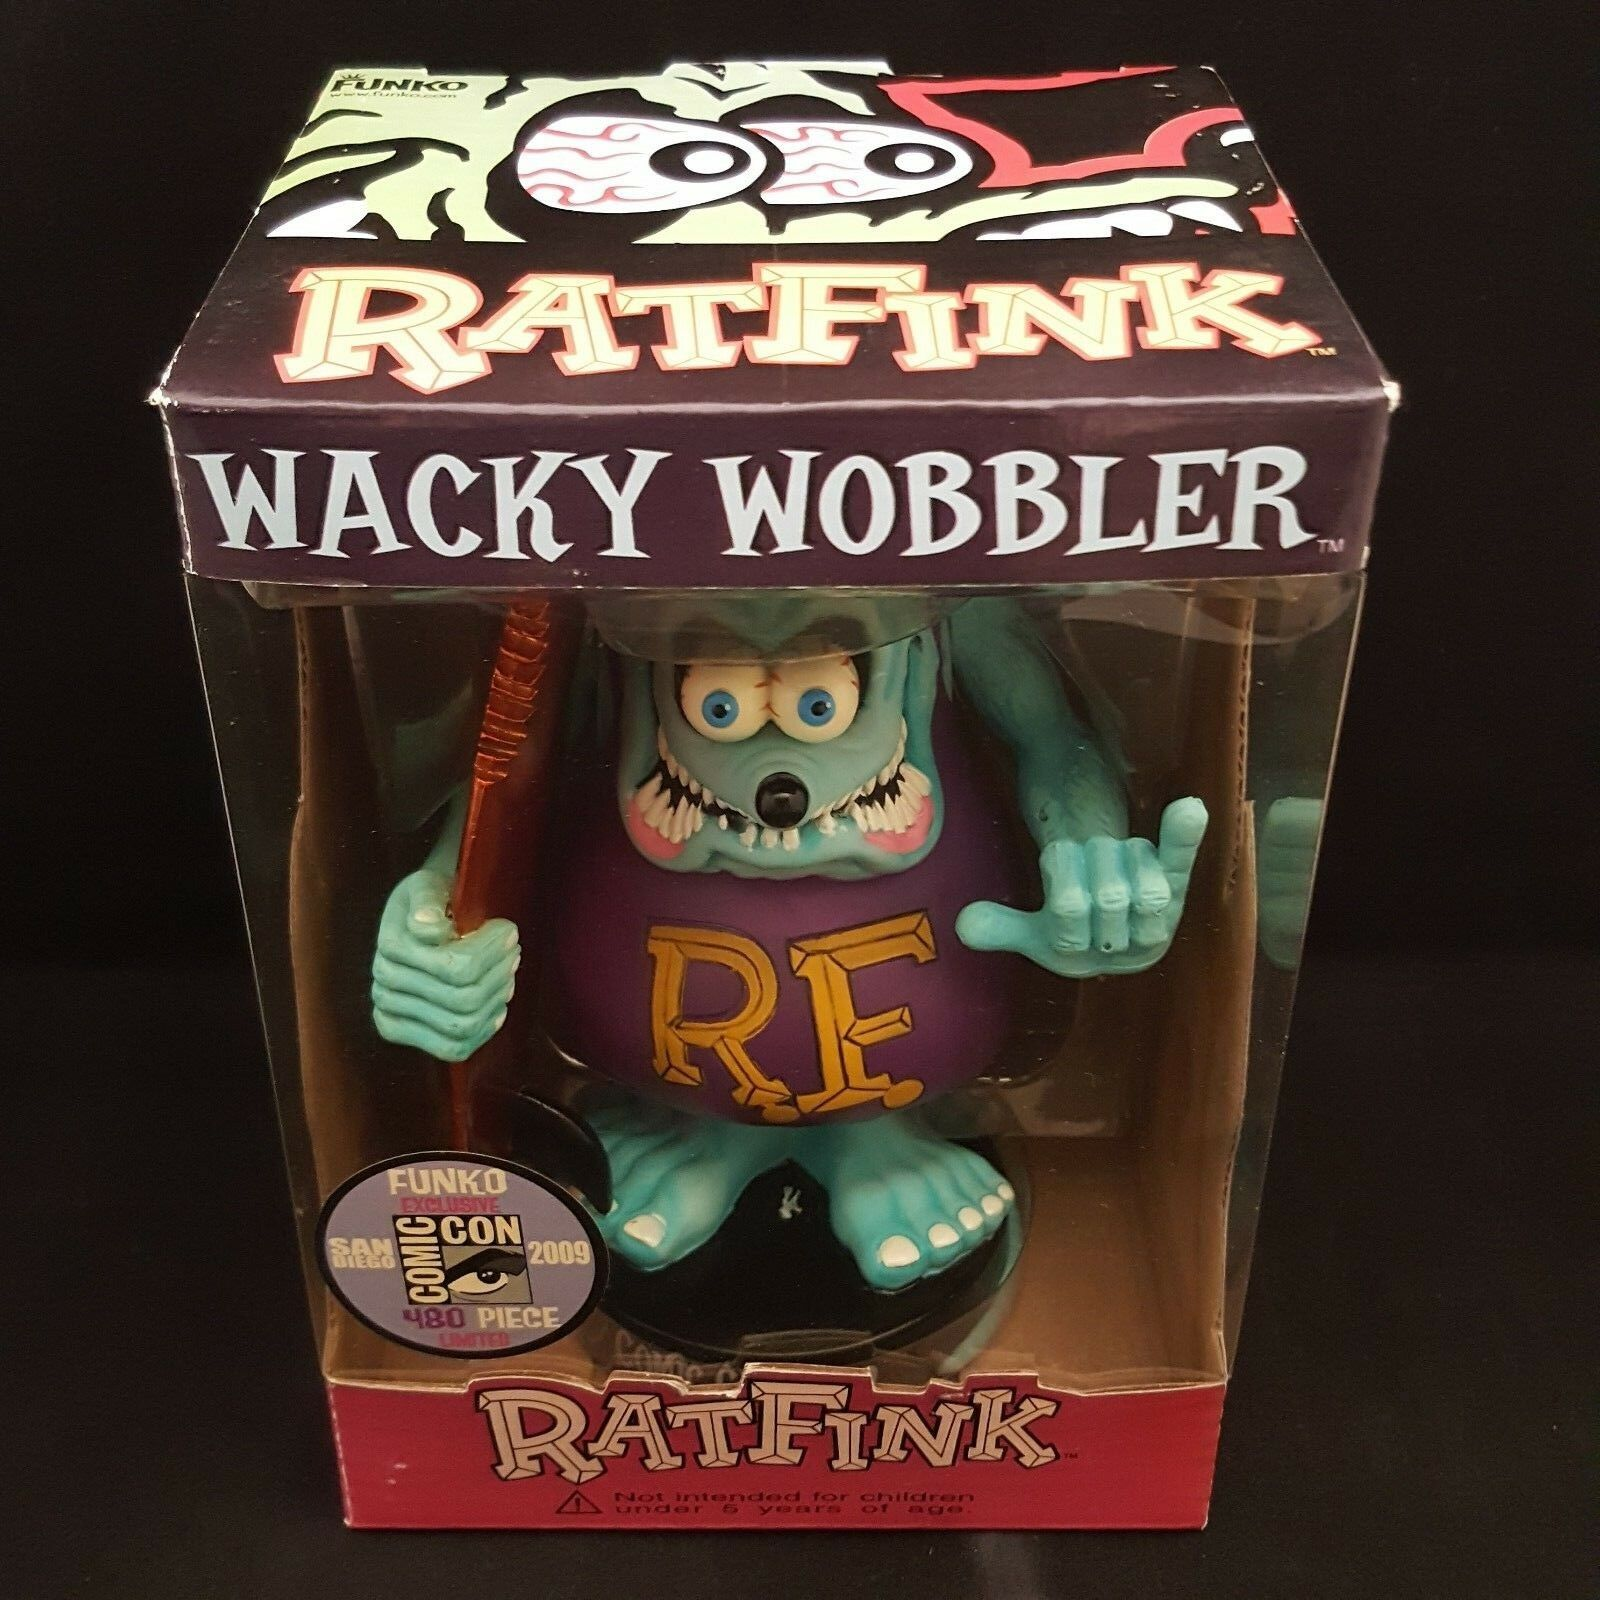 FUNKO Ed rojoh Rat Fink Surf Sdcc 2009 1 480 Wacky Wobbler Bobble Head desgaste de caja